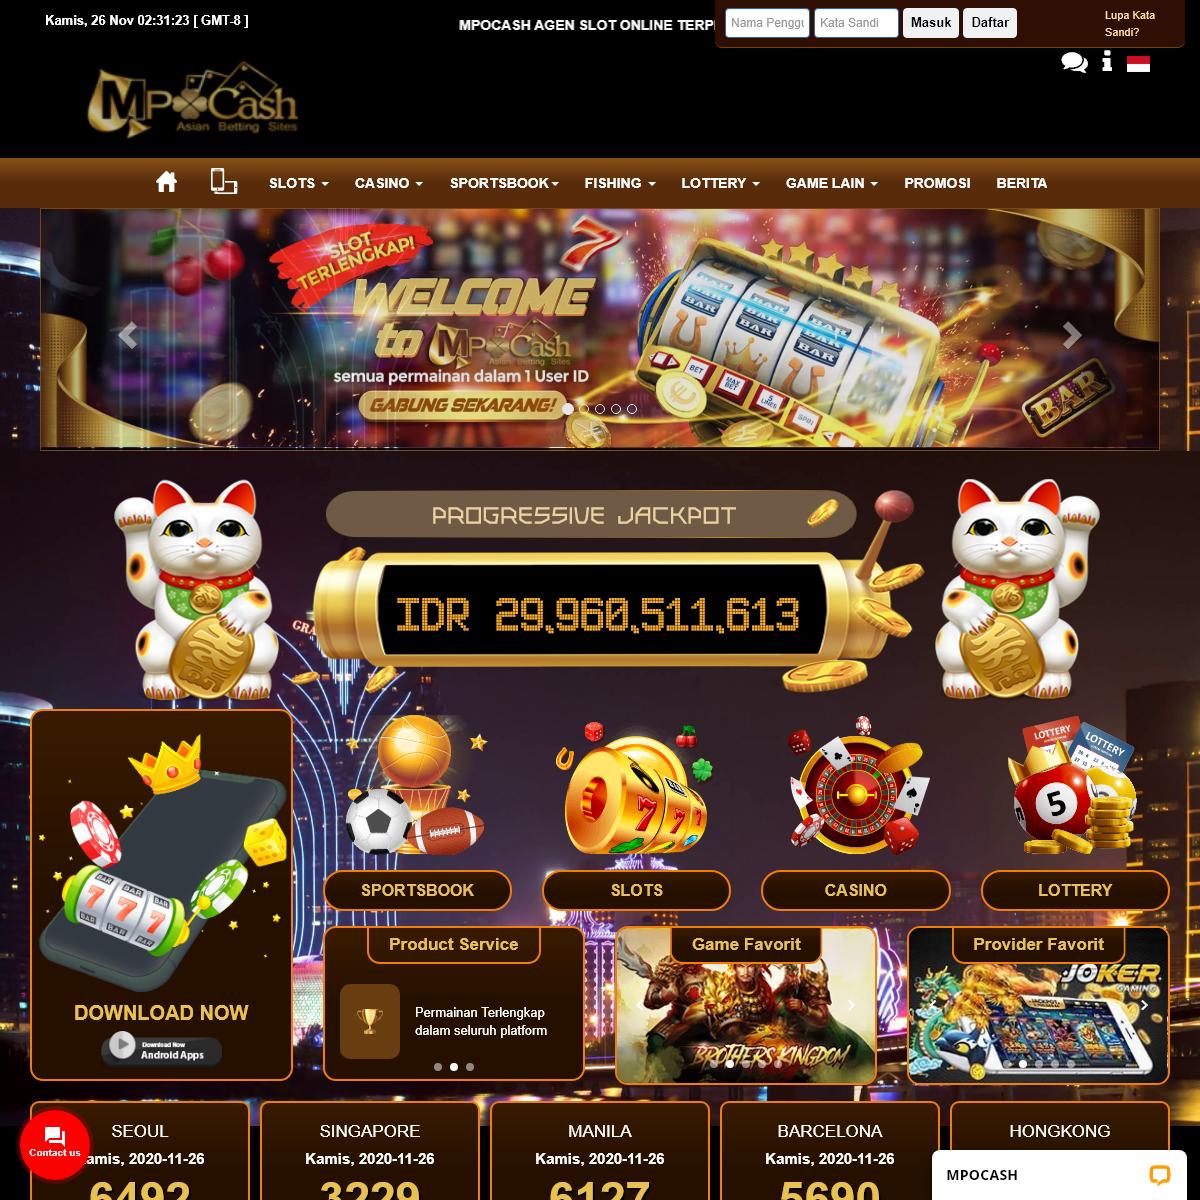 Situs slot online - Agen Slot Online - Judi Online - Mpocash